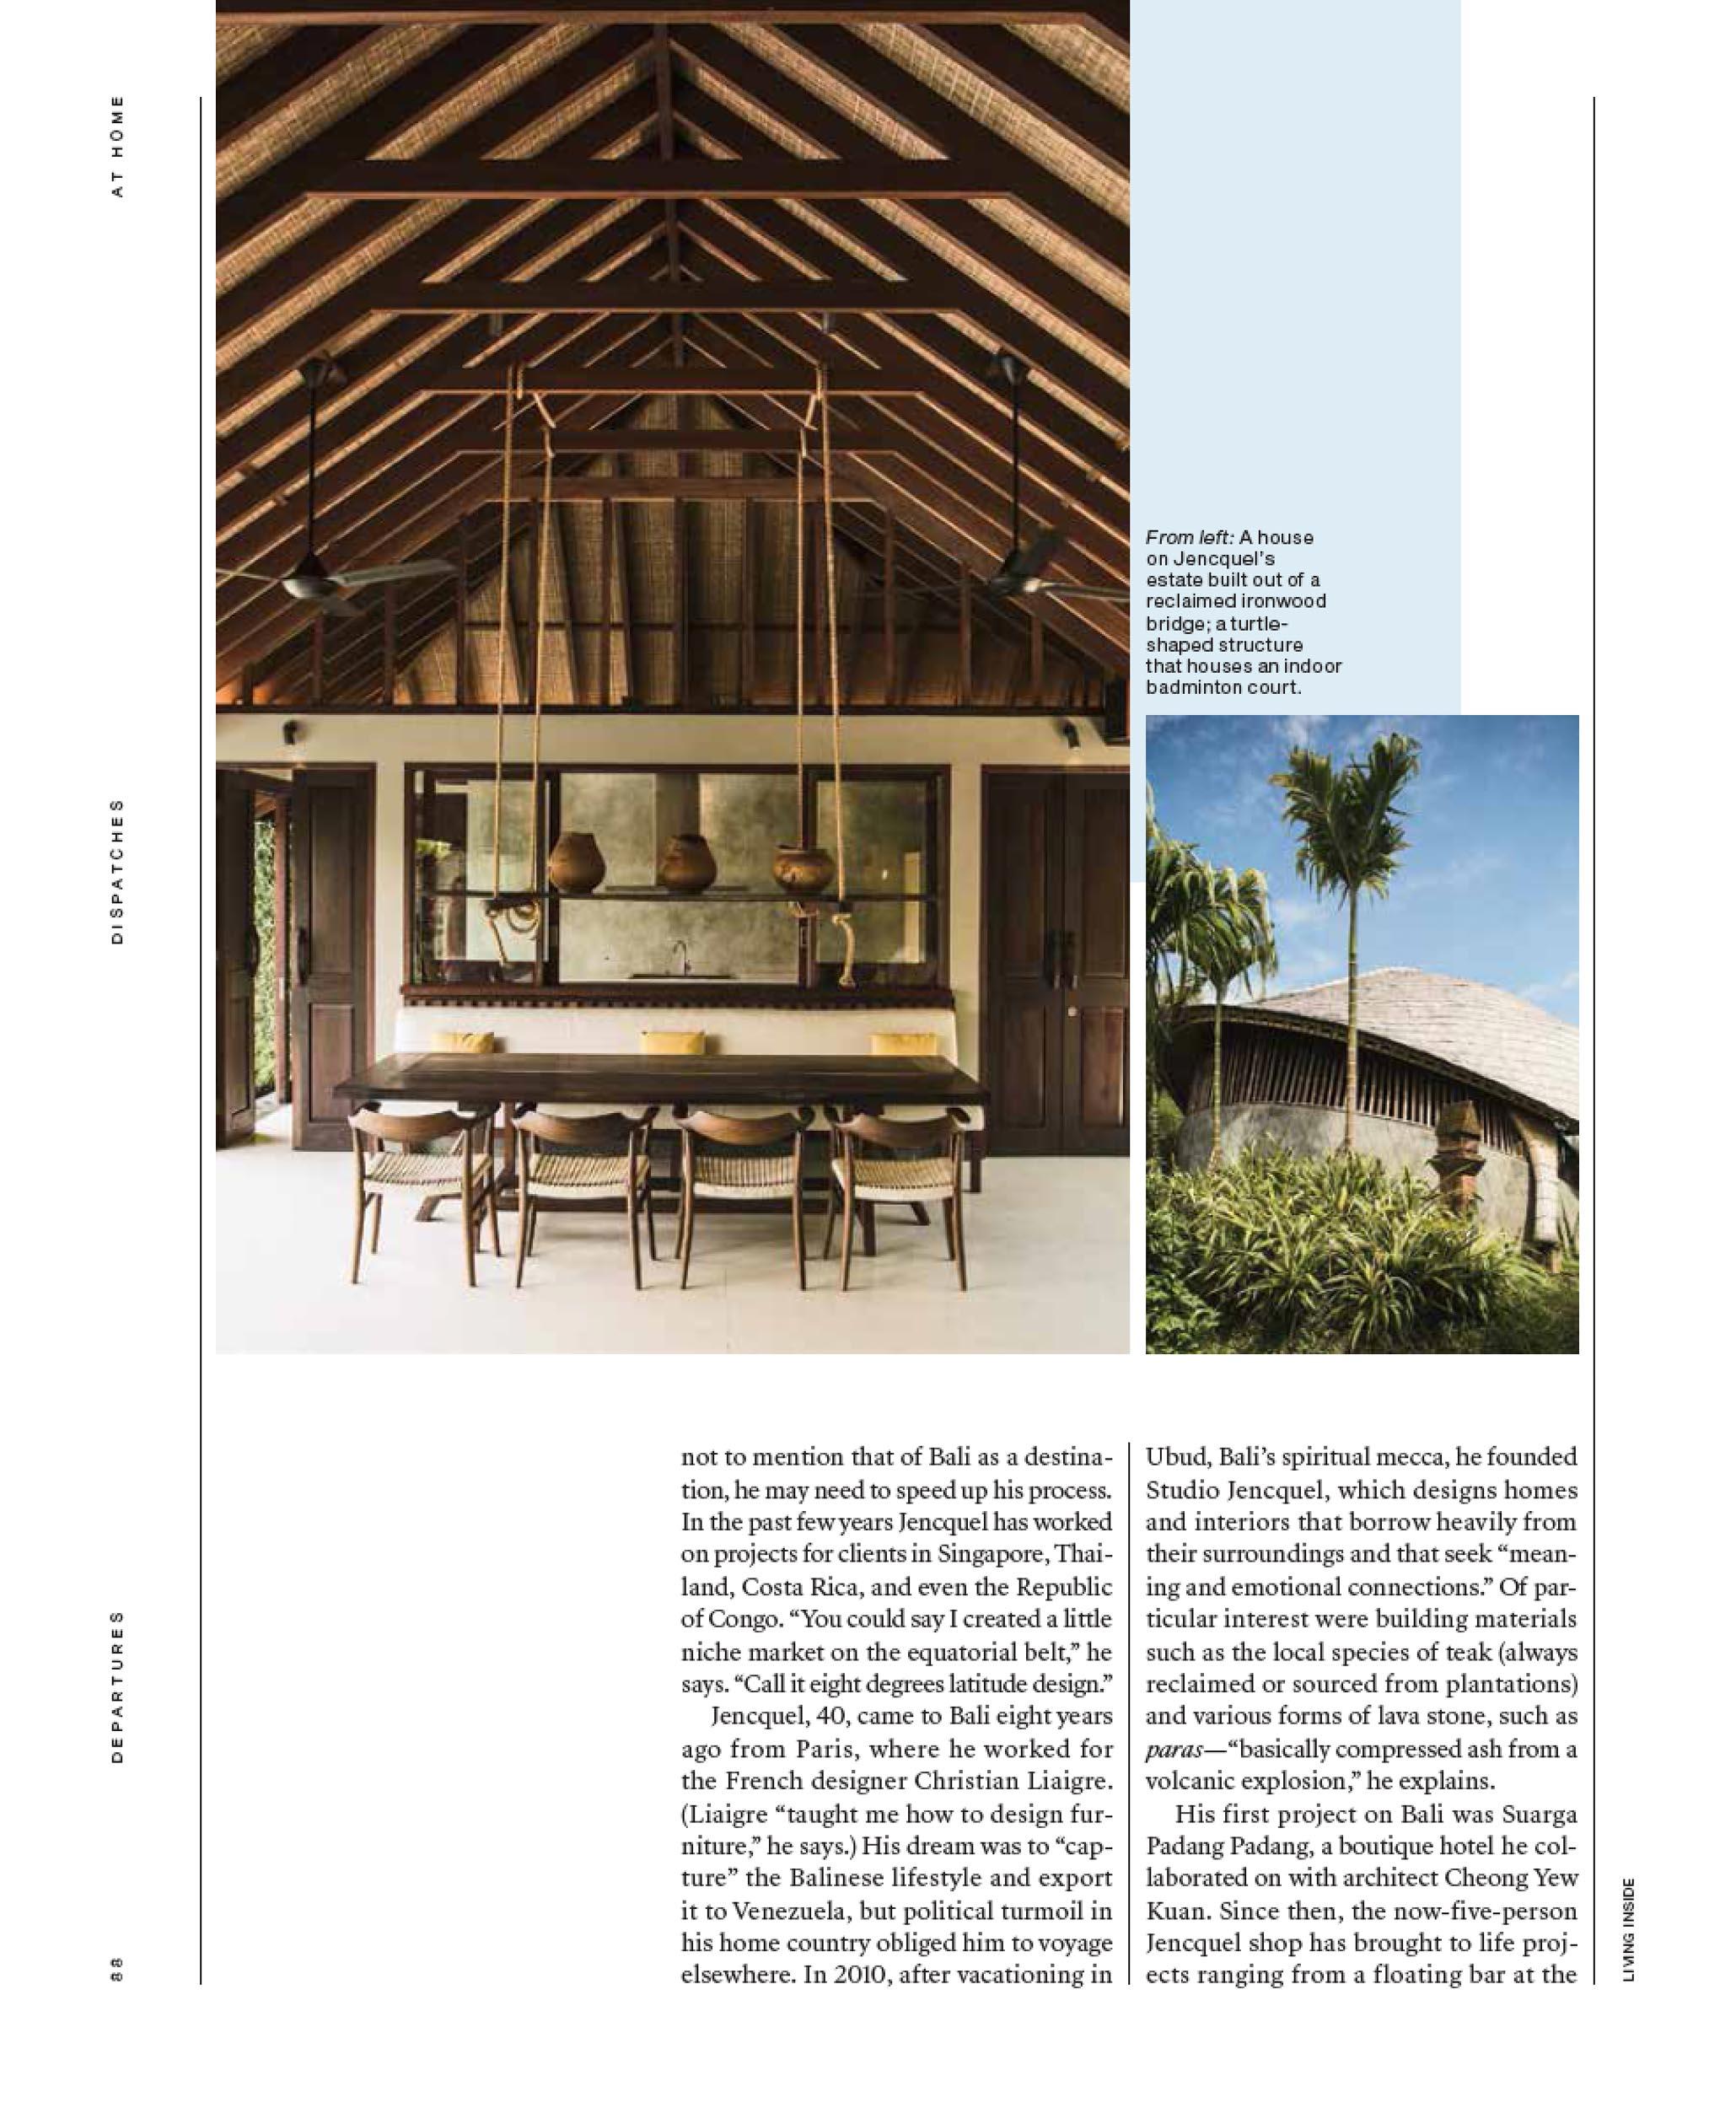 departures-magazine-maximilian-jenquel-bali-tommaso-riva-lisa-scappin-interiors-bamboo (3 of 4).jpg